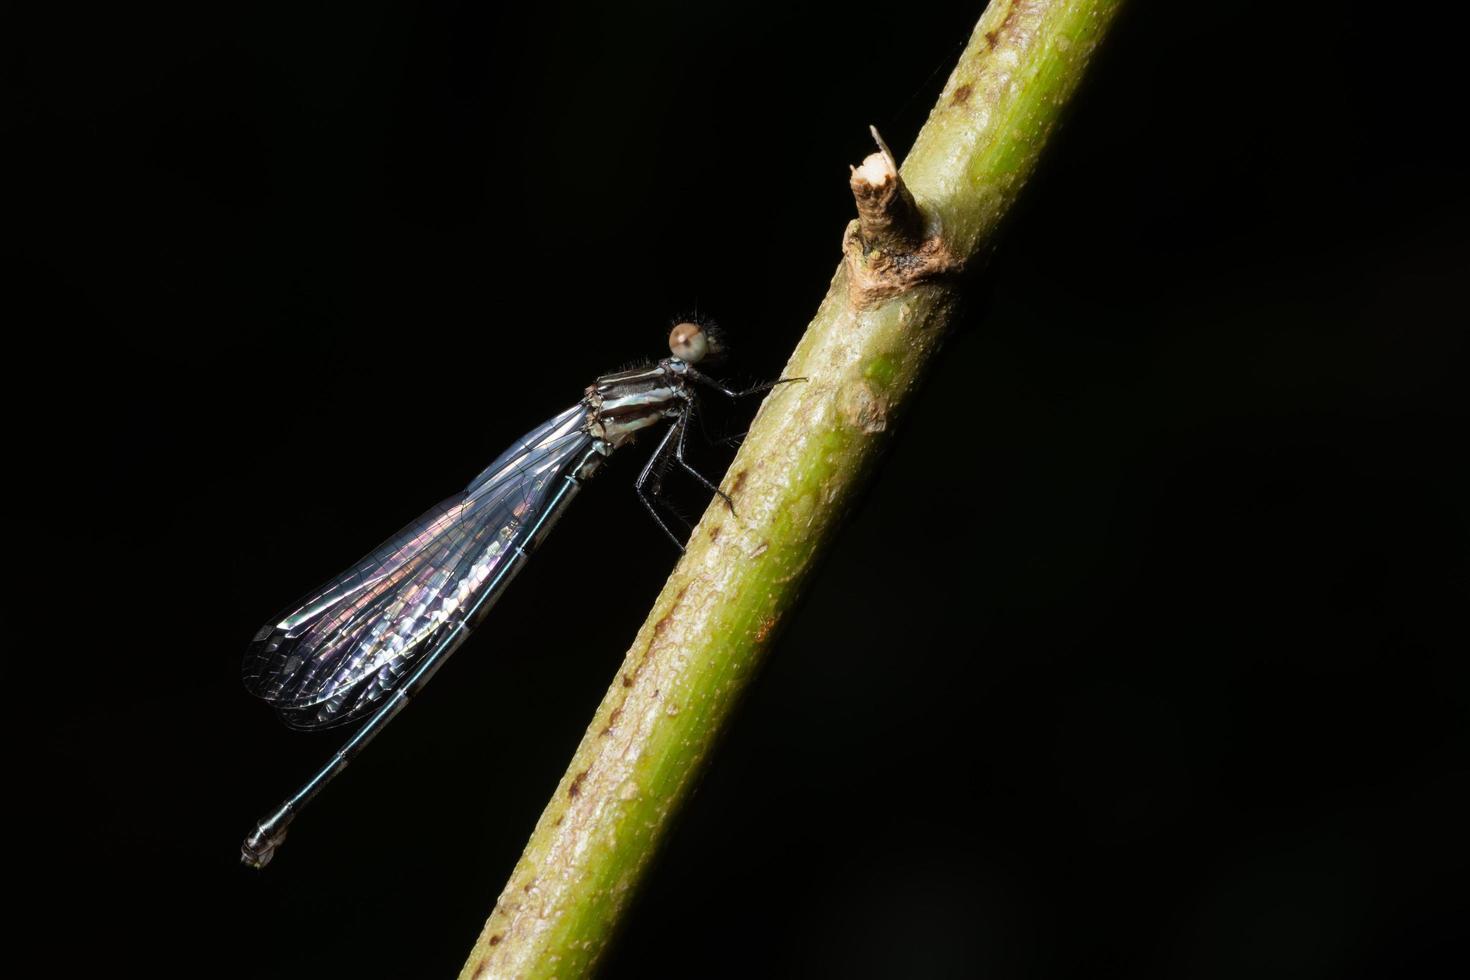 Dragonfly climbs plant stem photo